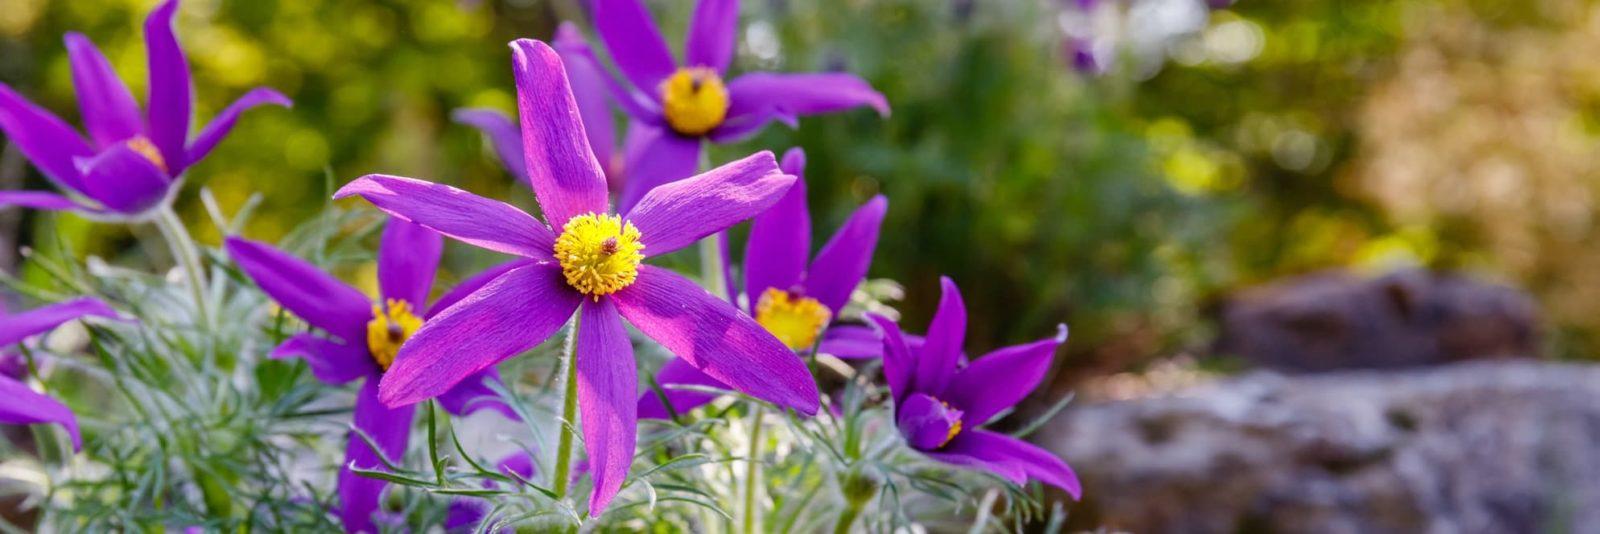 purple Pulsatilla vulgaris flowers with rocks in the background